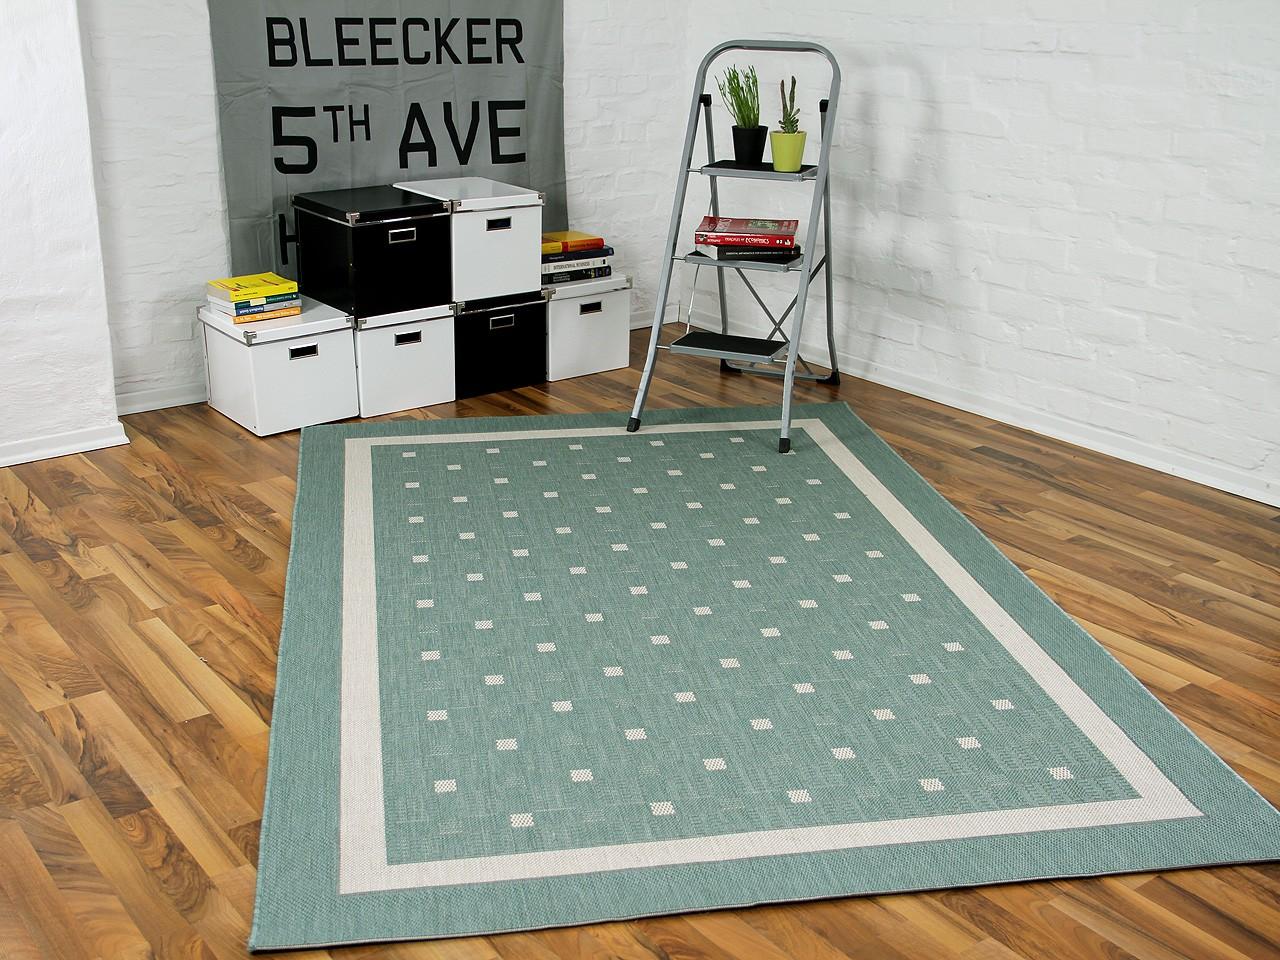 modern flachgewebe ruggy mintgr n bord re teppiche sisal und naturteppiche designer flachgewebe. Black Bedroom Furniture Sets. Home Design Ideas